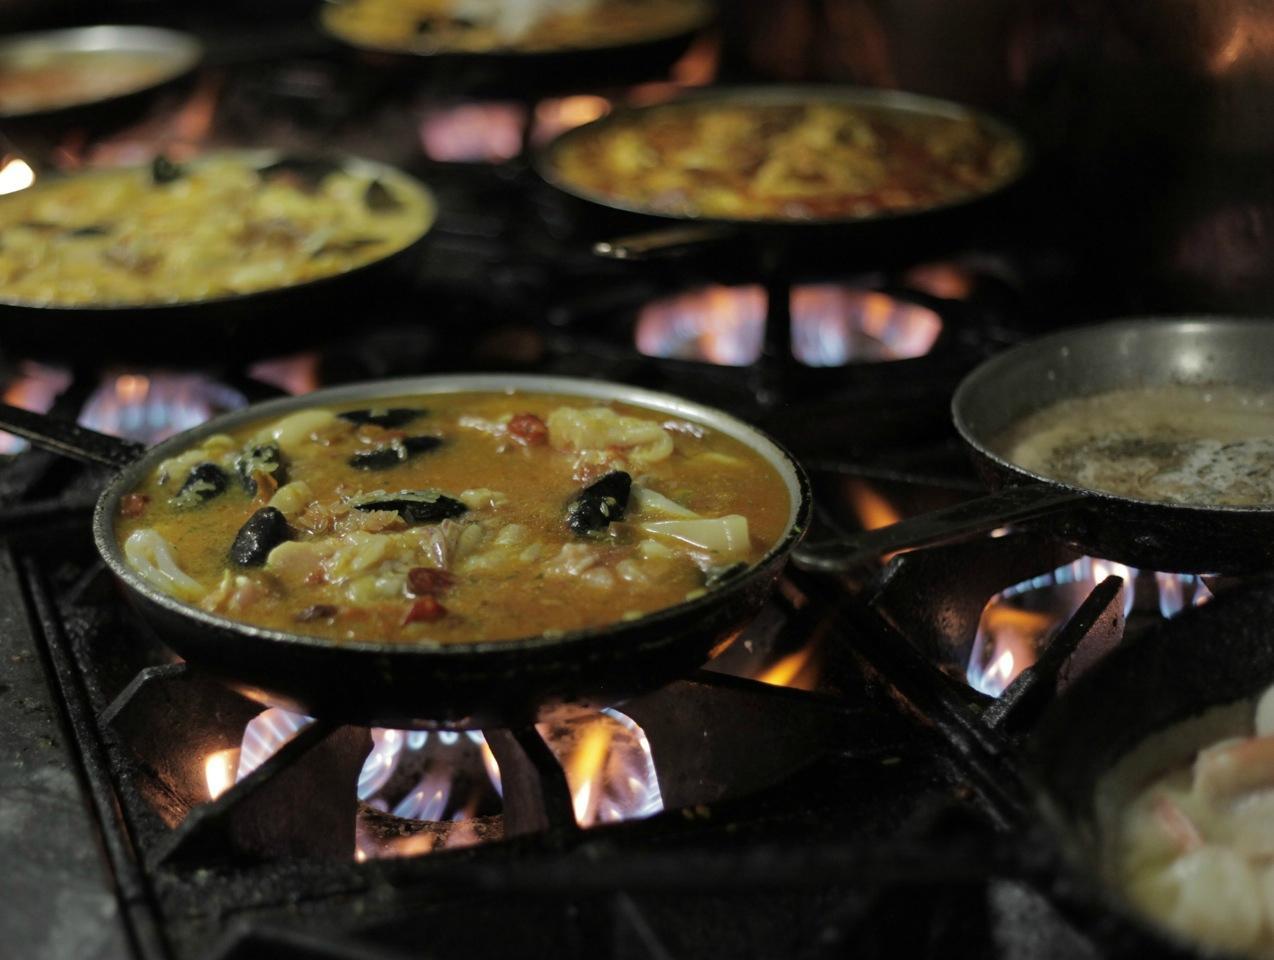 food-on-stove